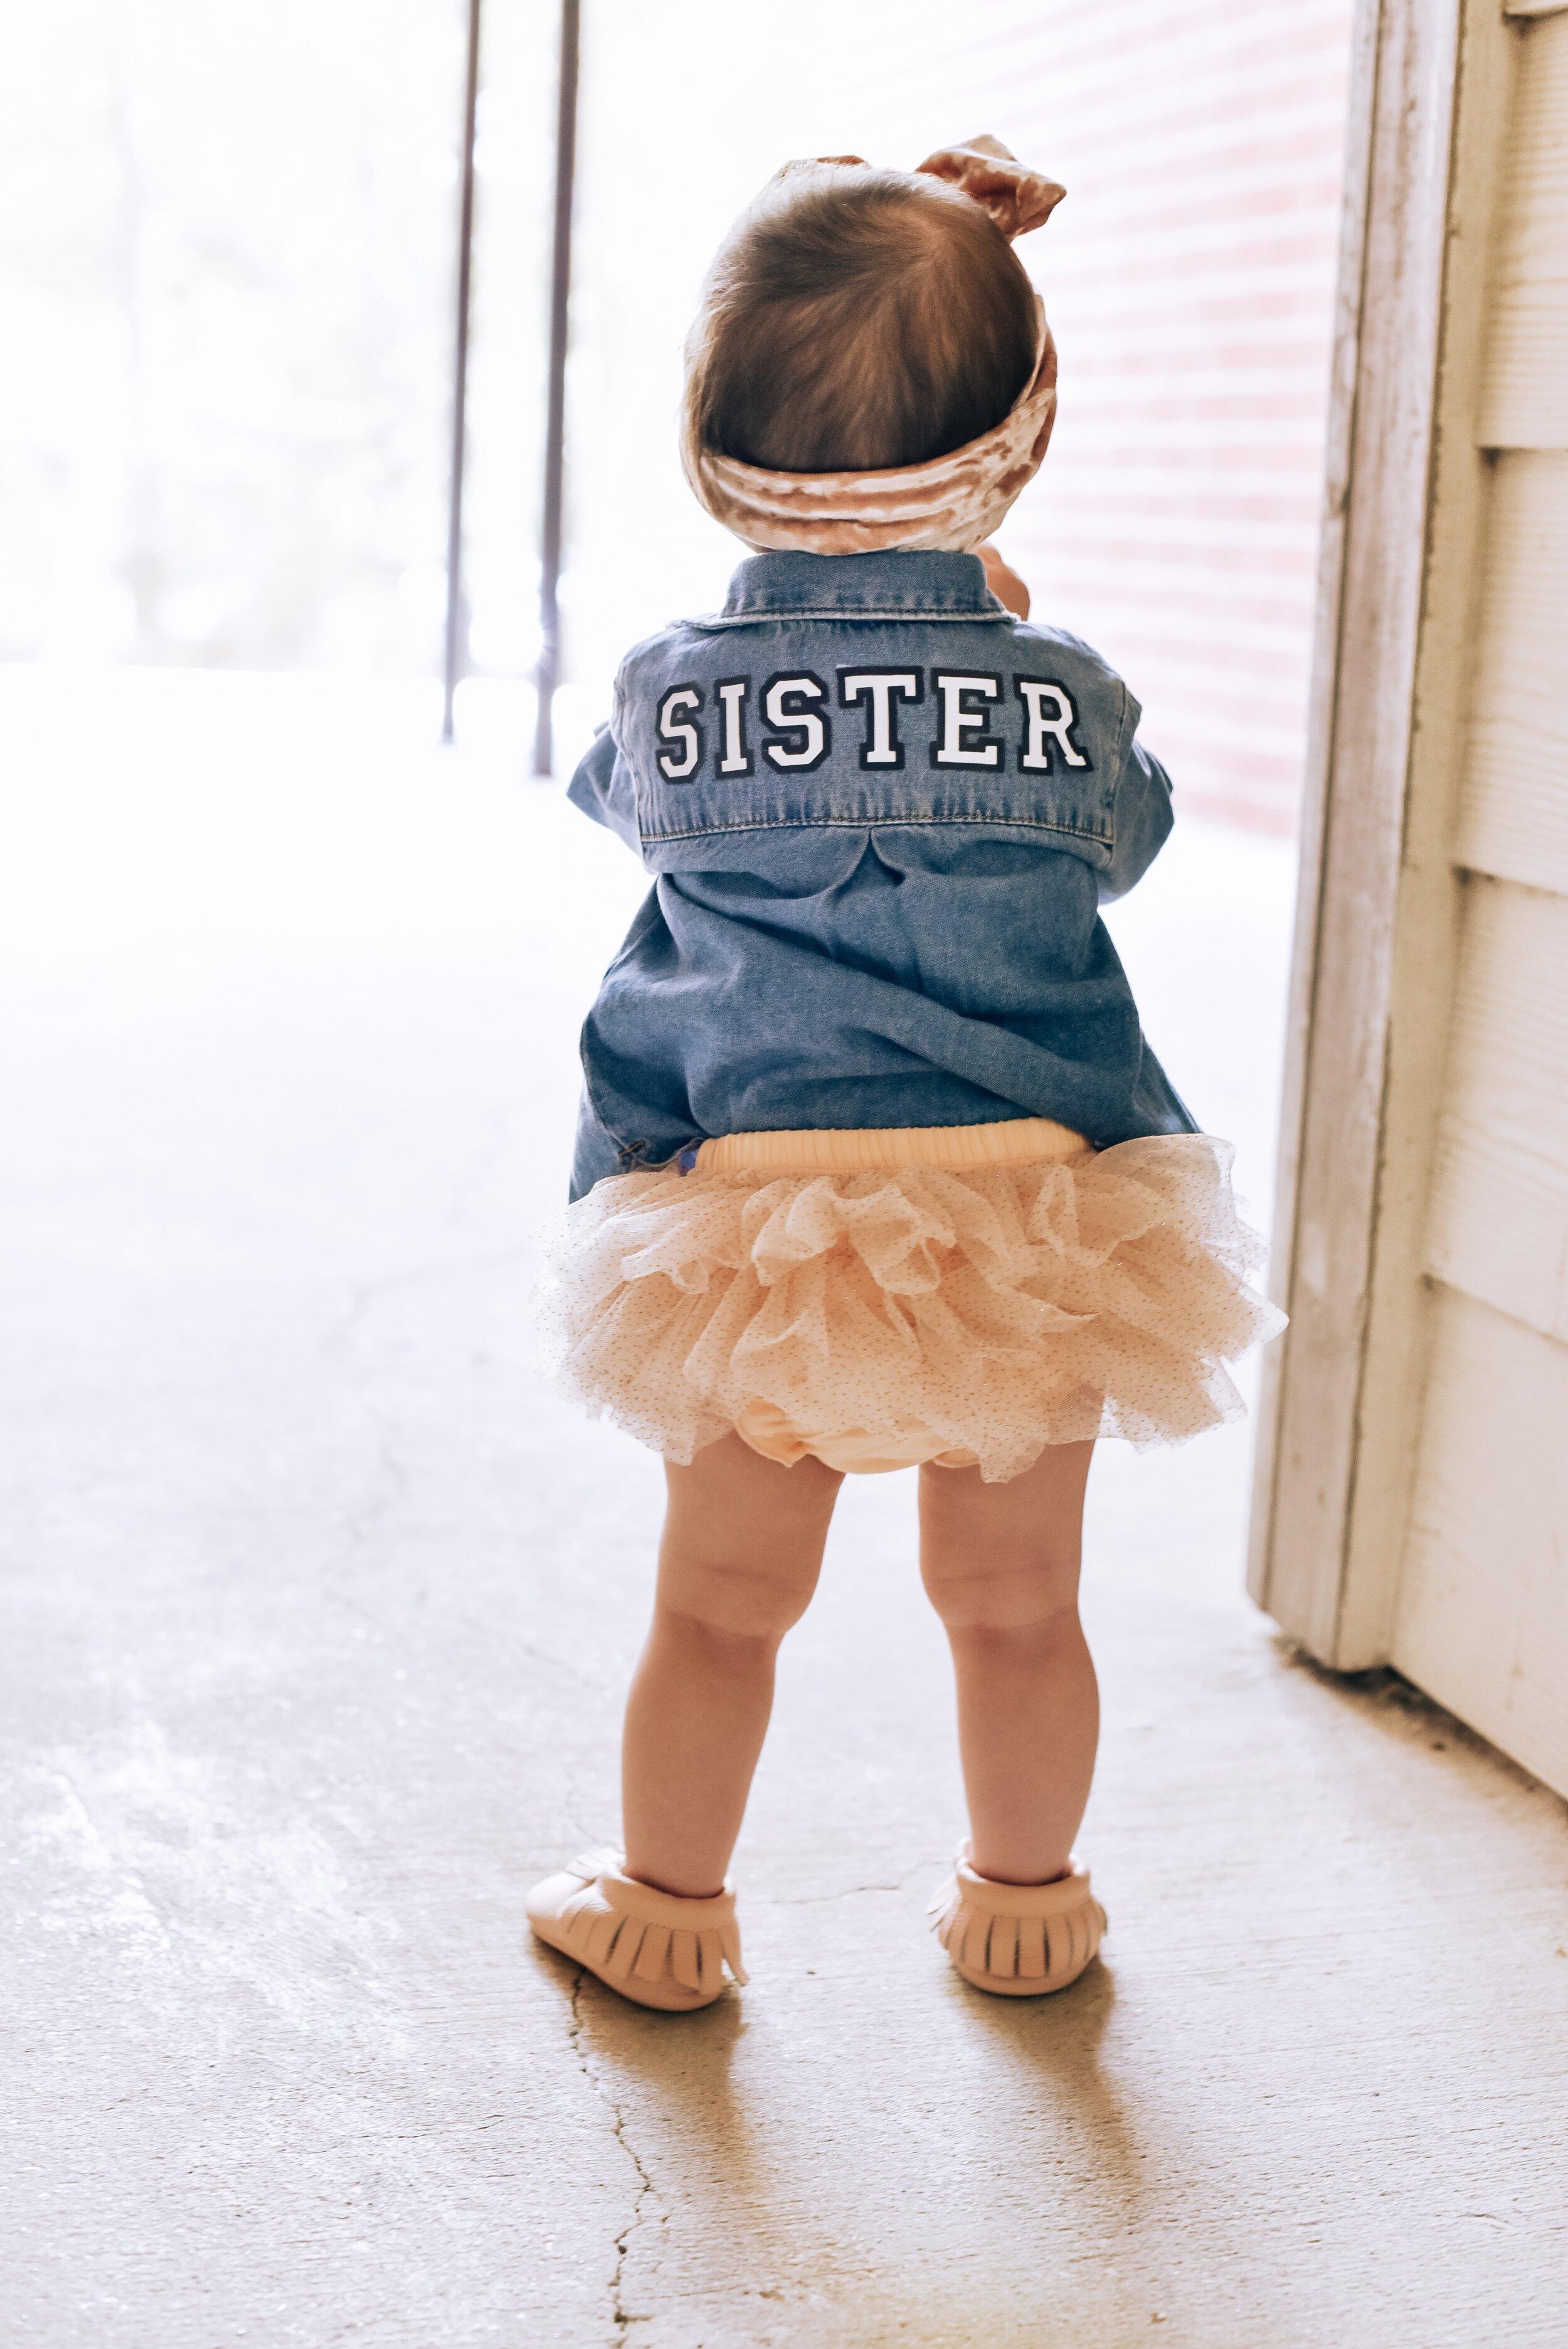 big sister - pregnancy announcement